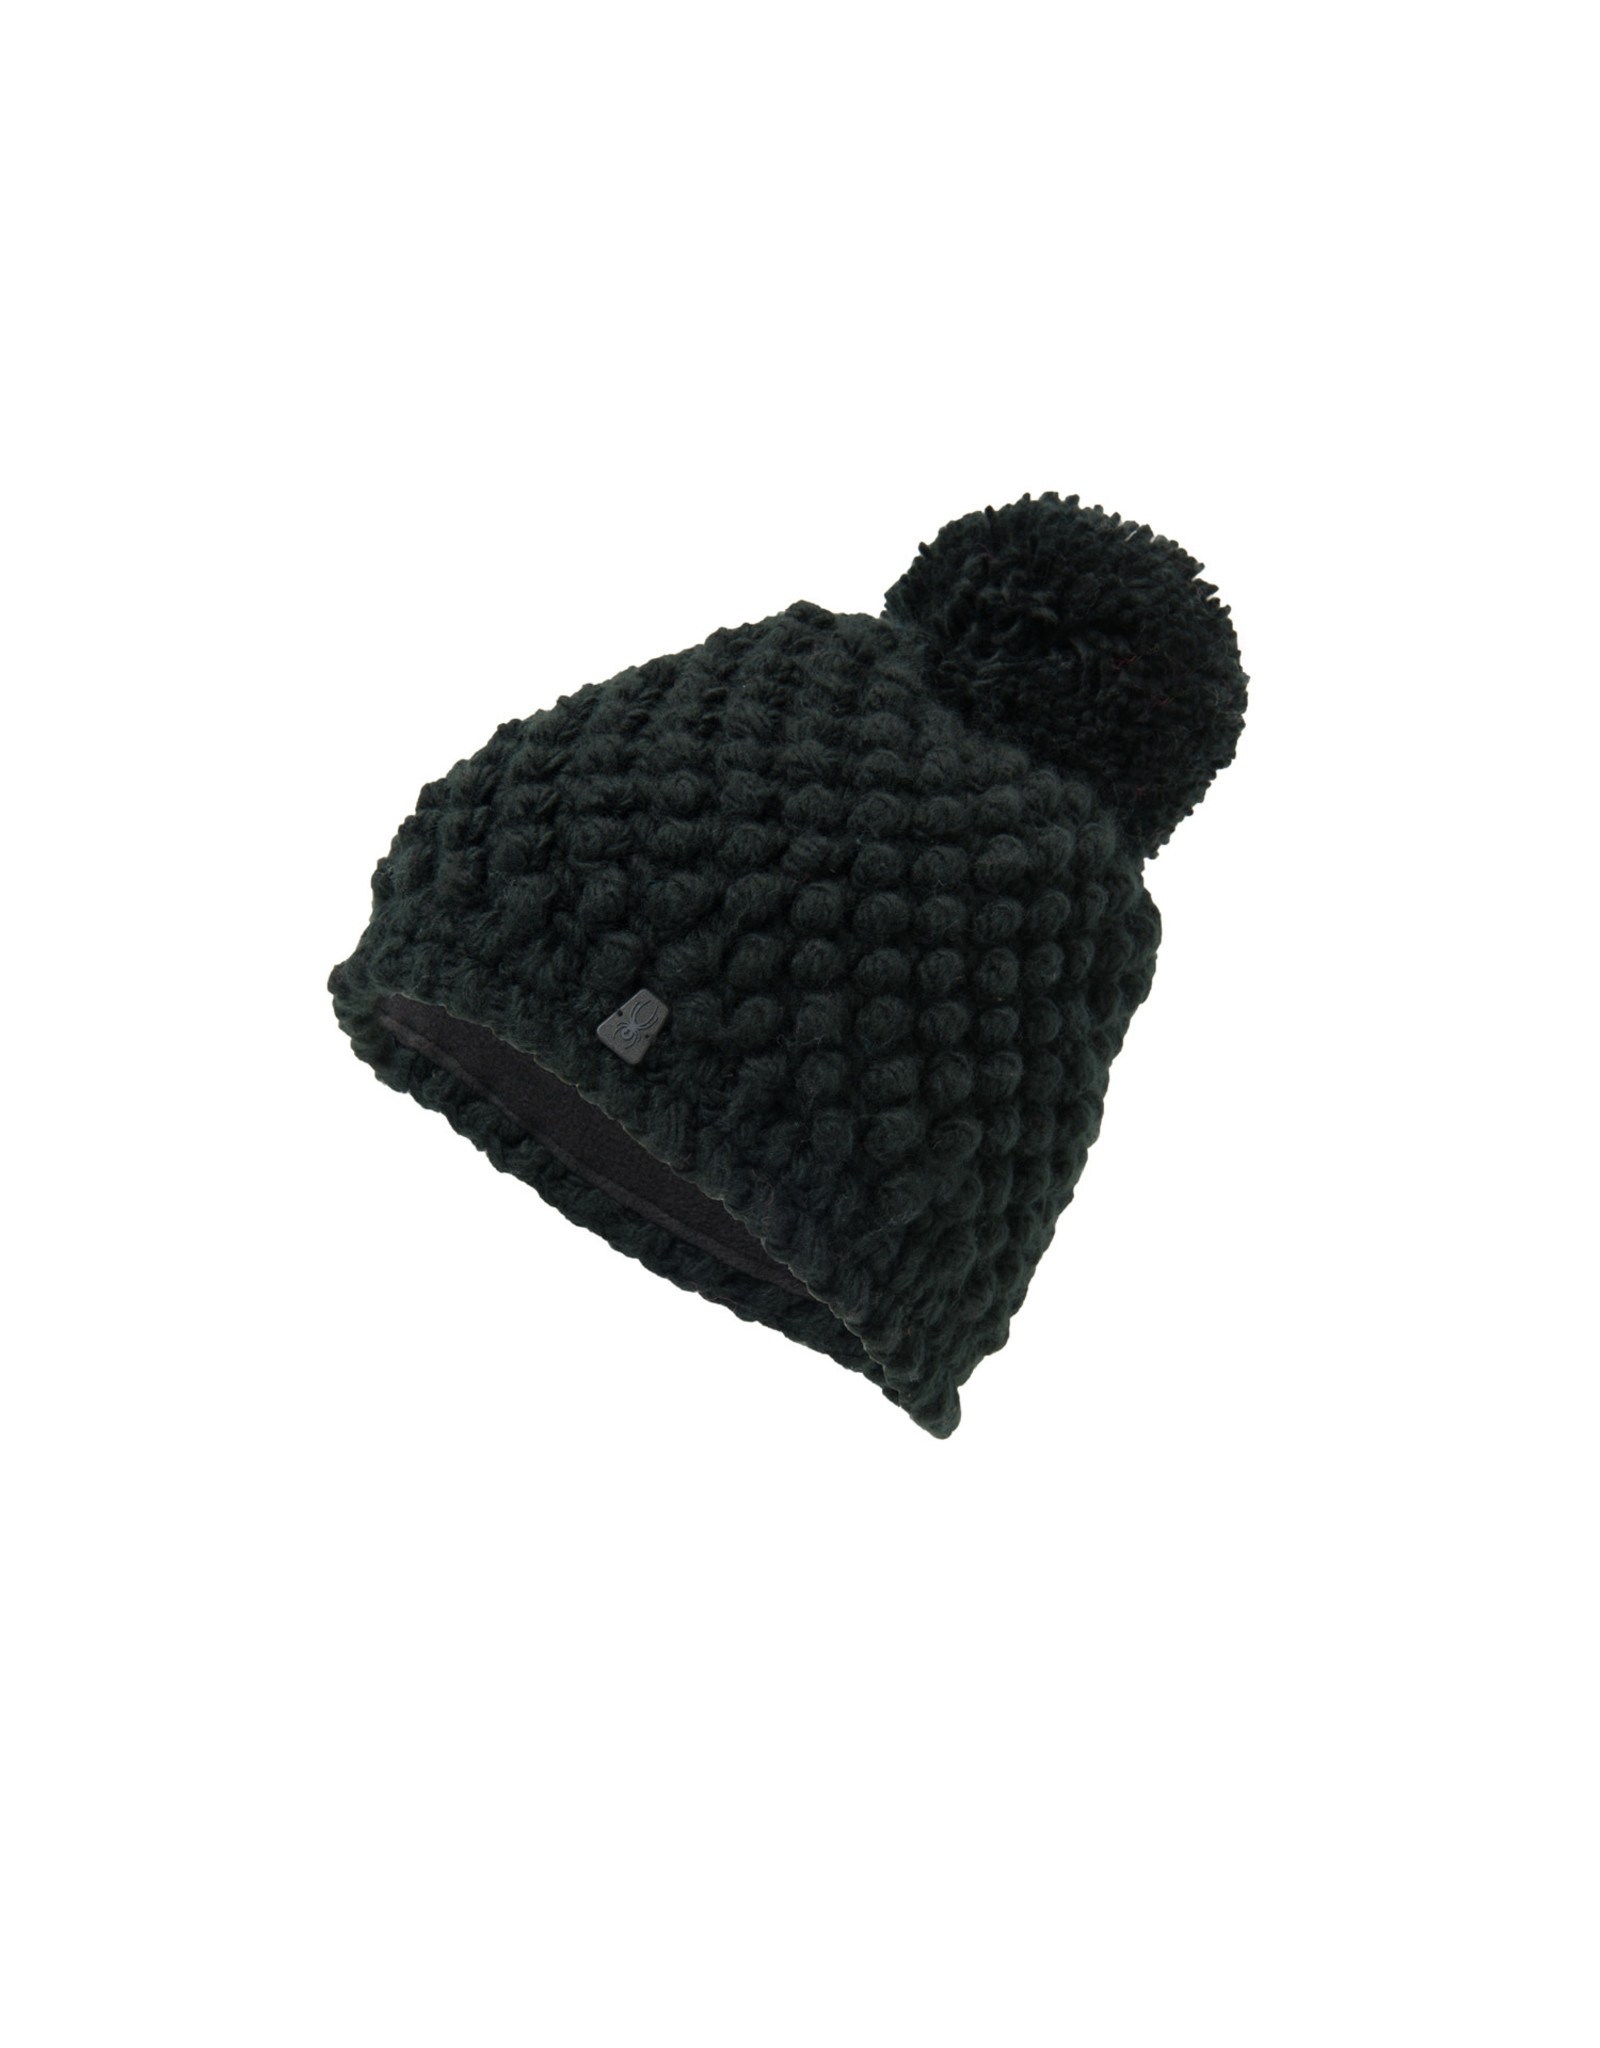 Spyder Spyder Women's BRRR Berry Hat